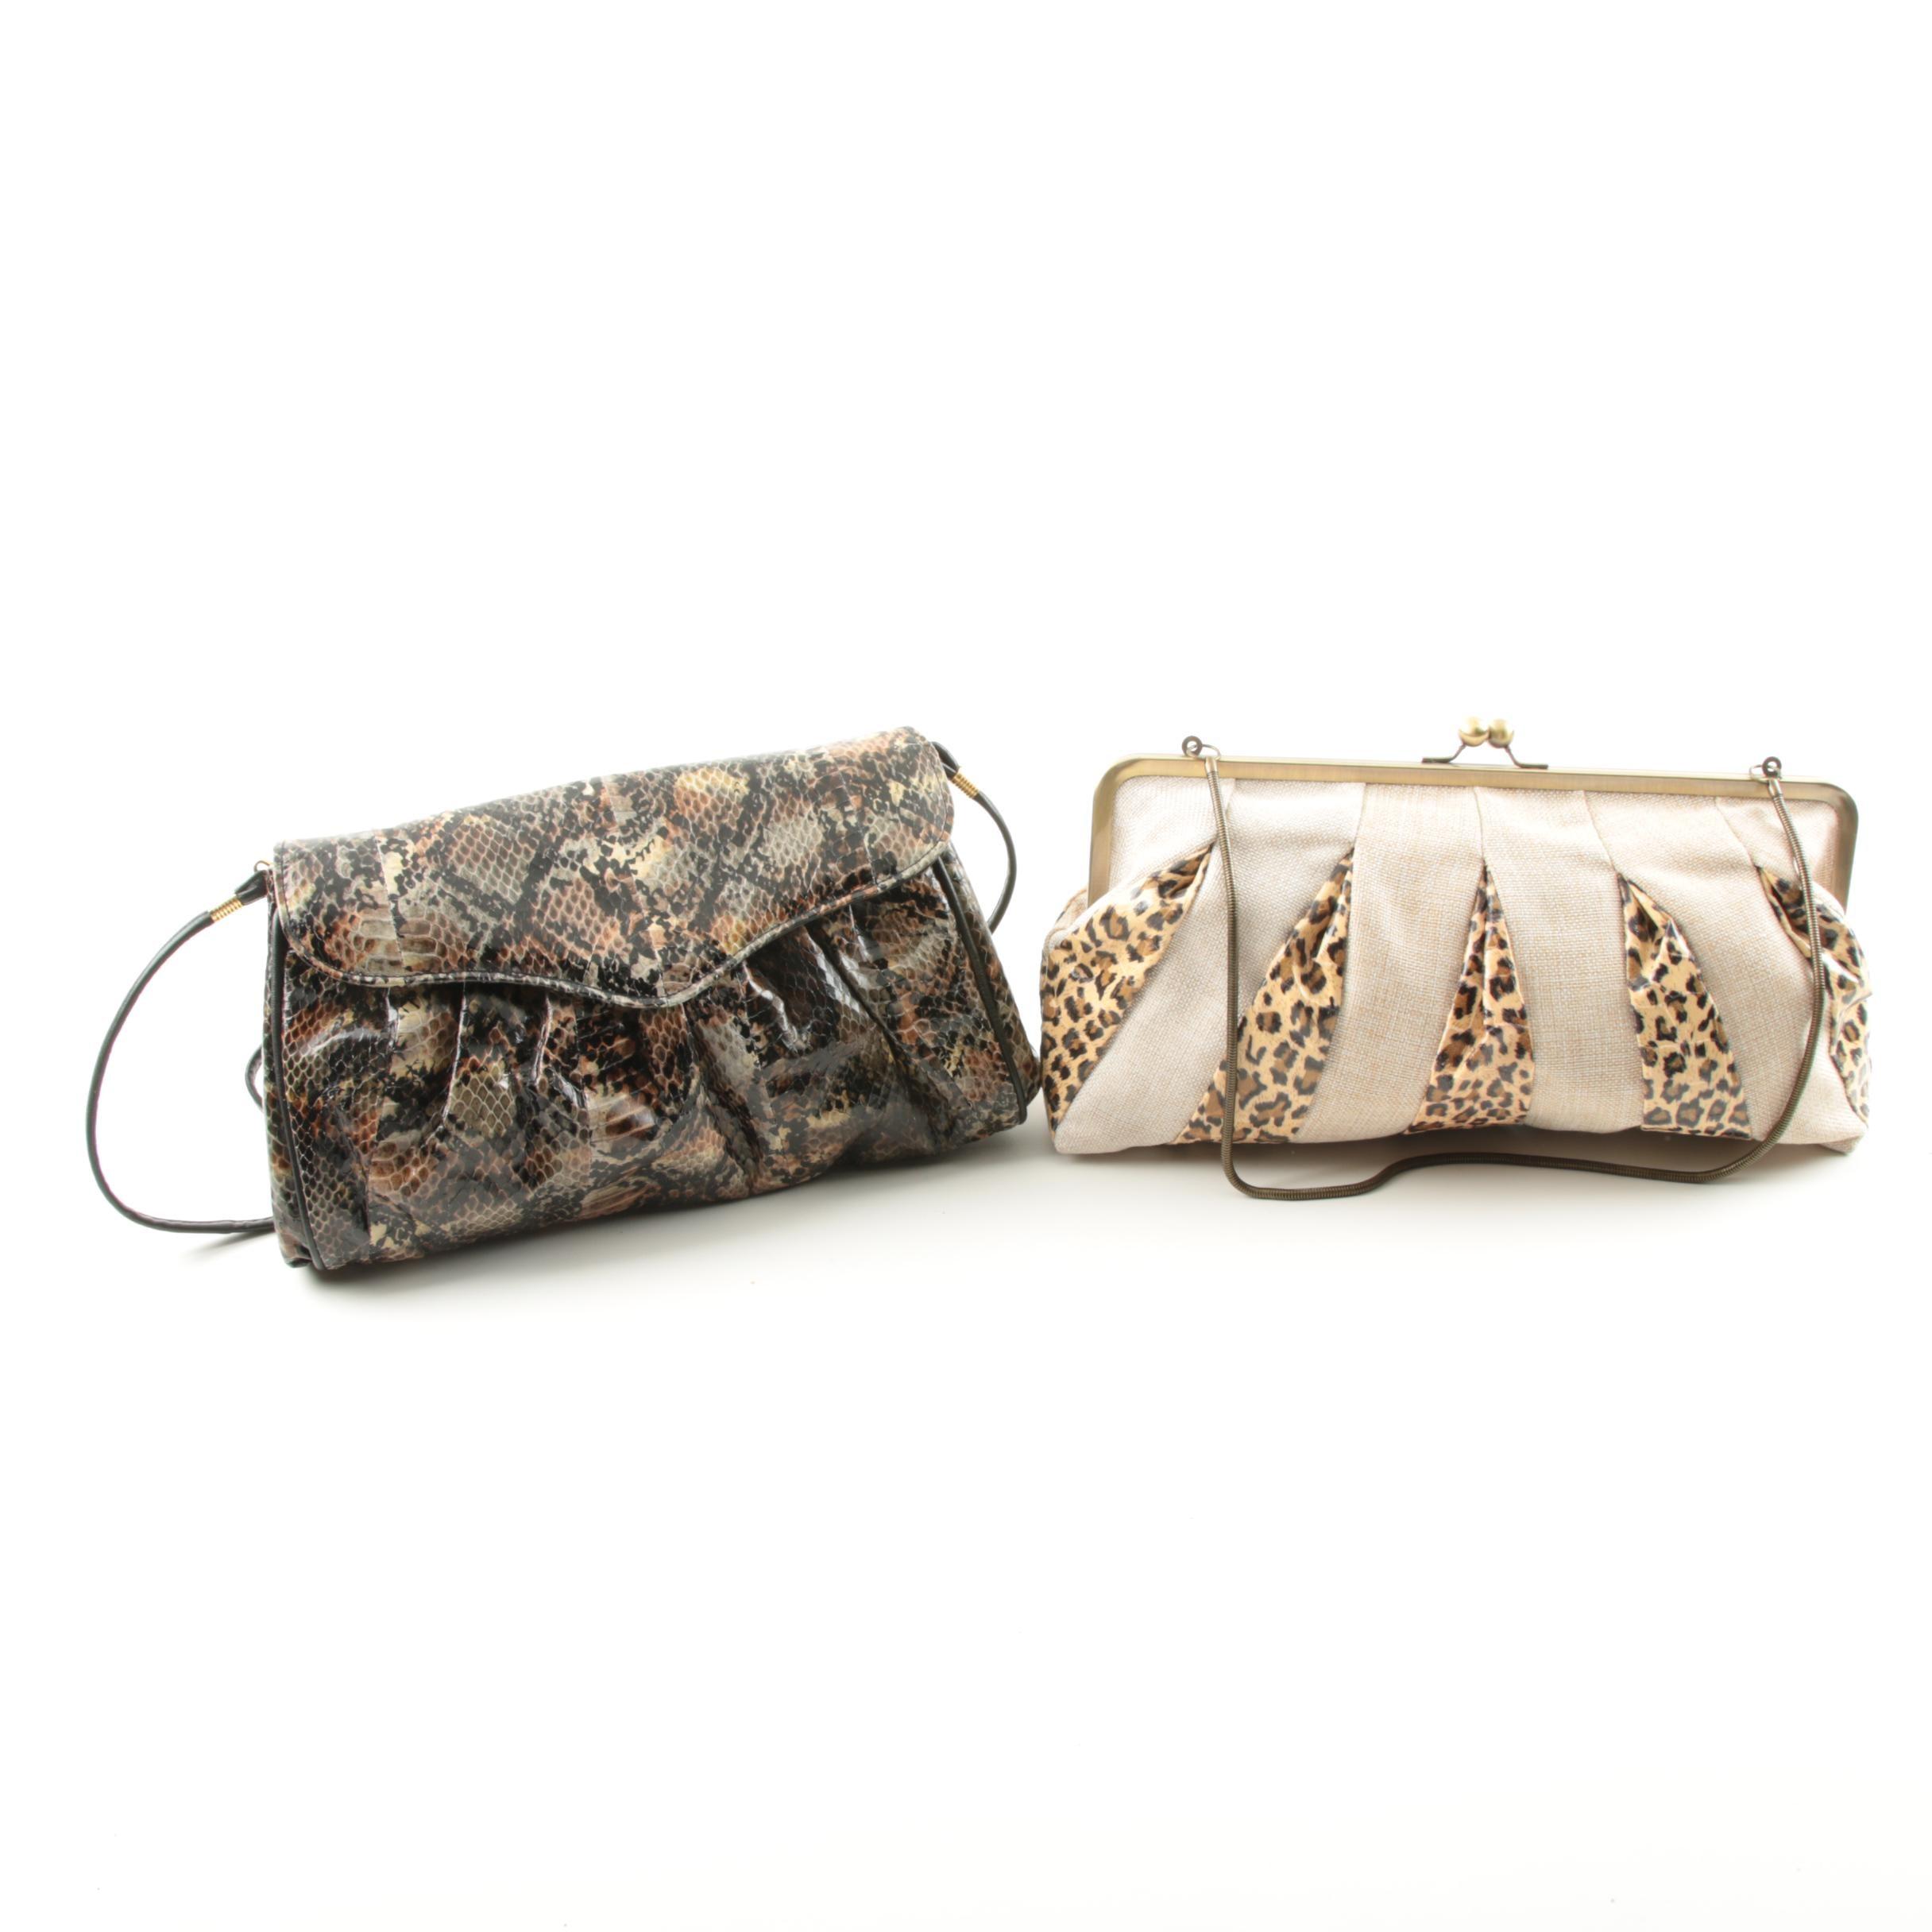 Leopard Print and J. Reneé Snakeskin Handbags